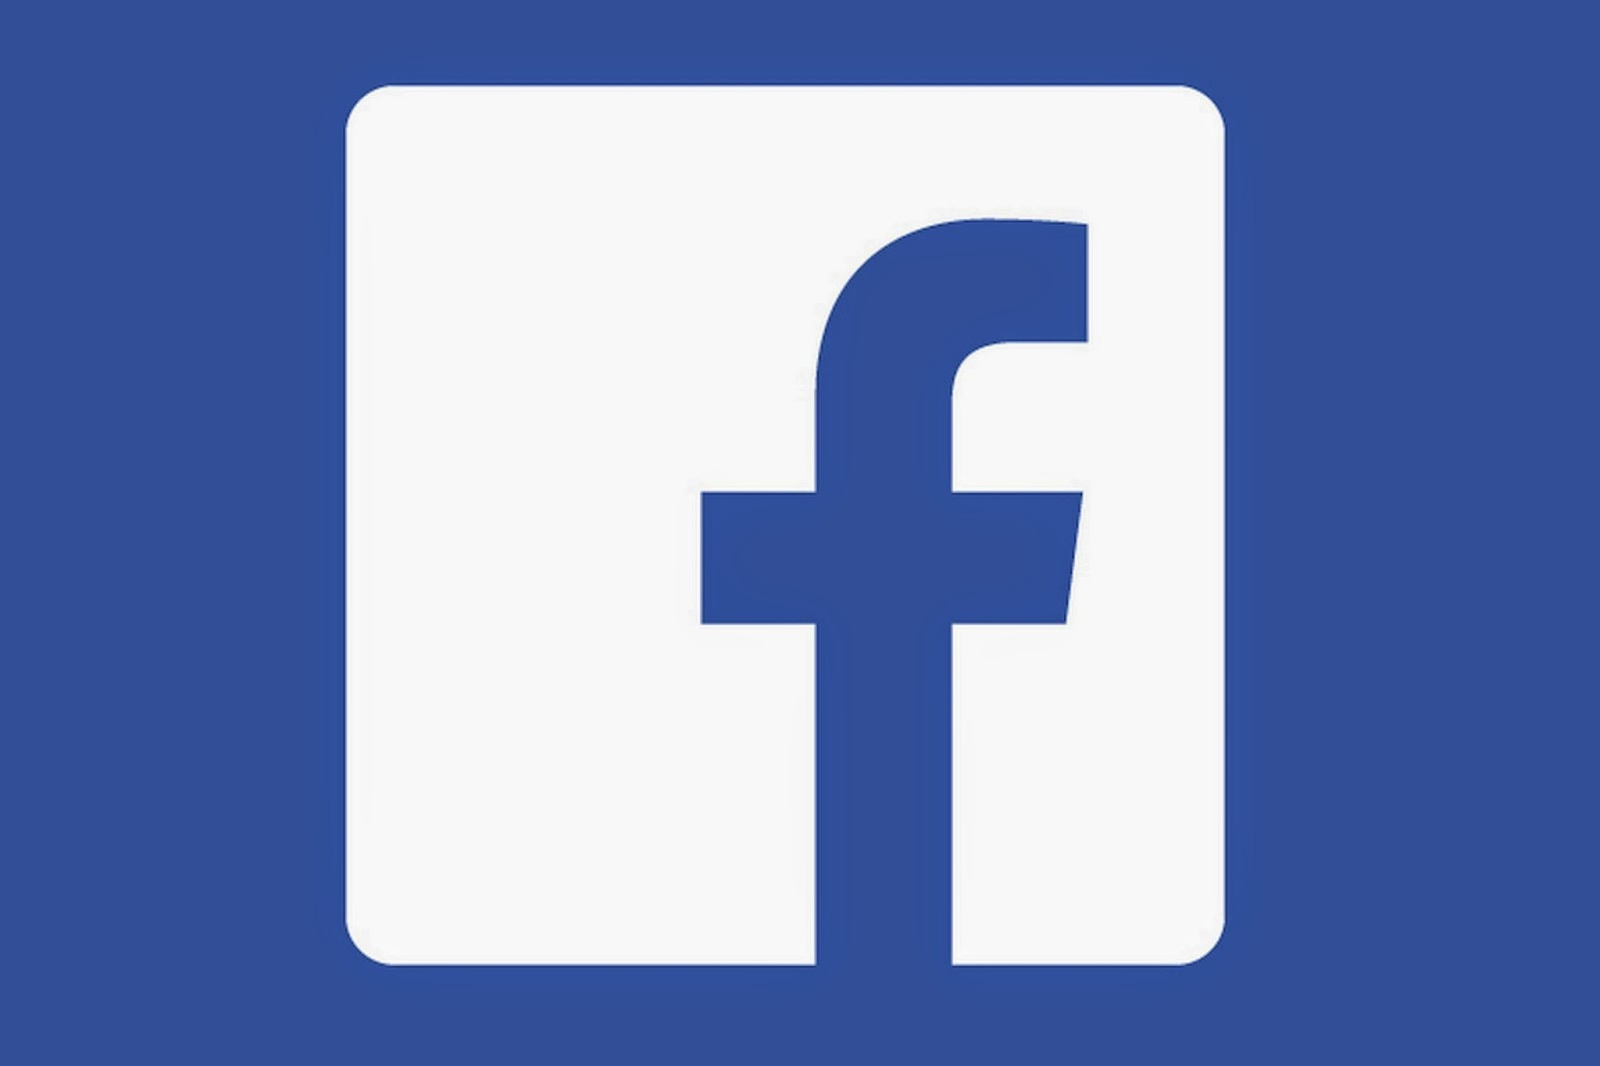 aplikasi facebook seluler untuk nokia 6600